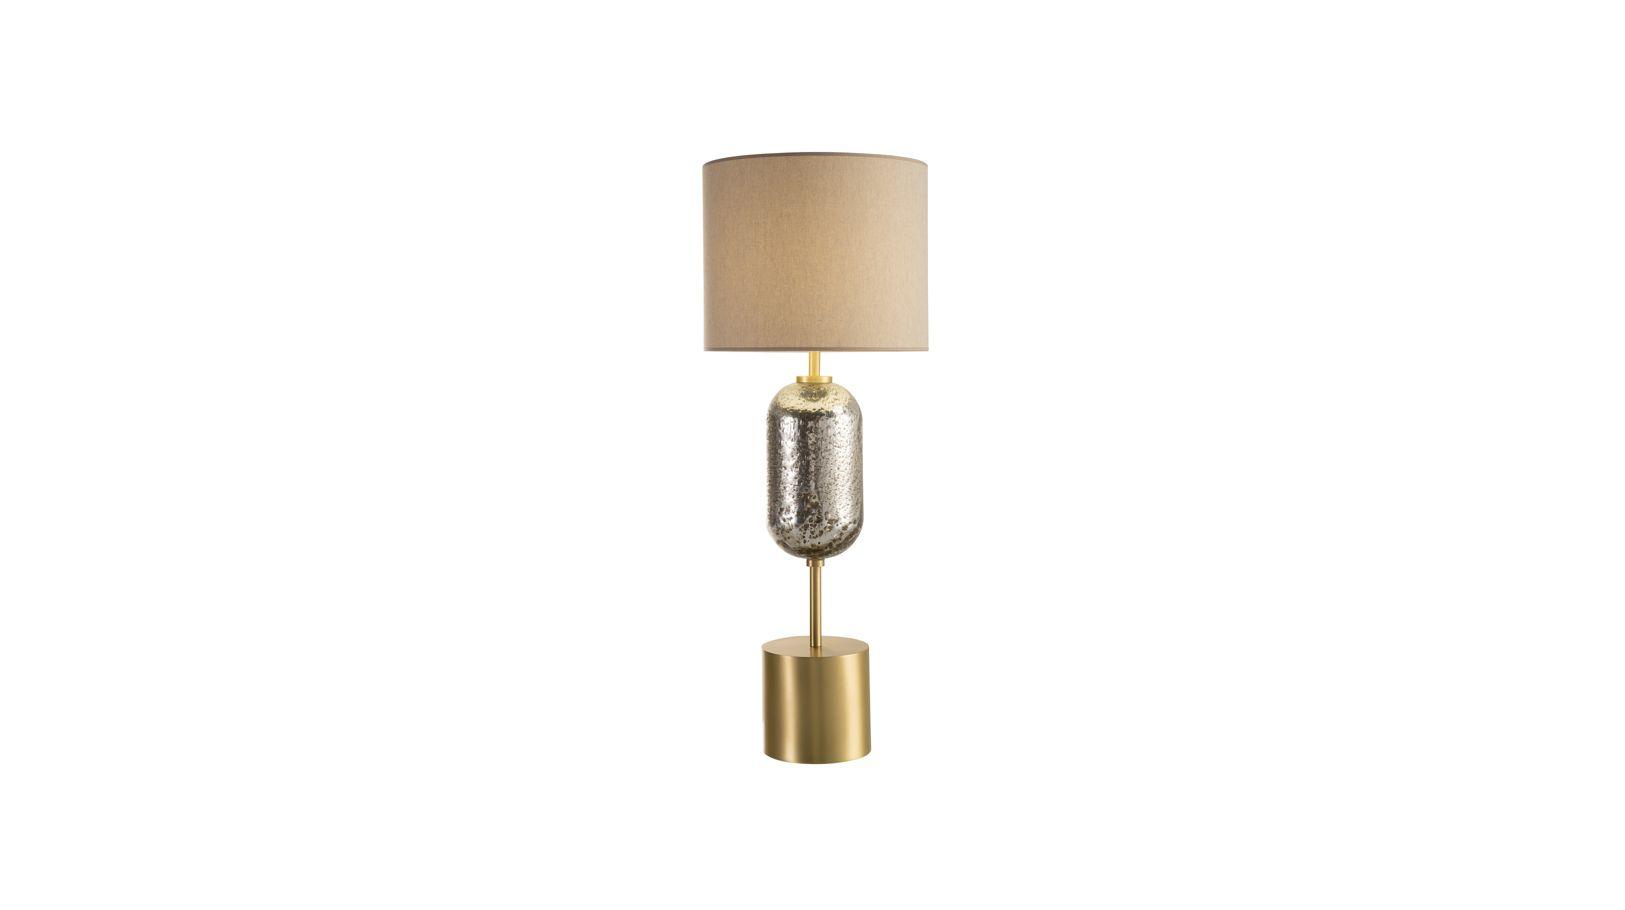 Winnipeg lamp roche bobois - Lampadaire roche bobois ...